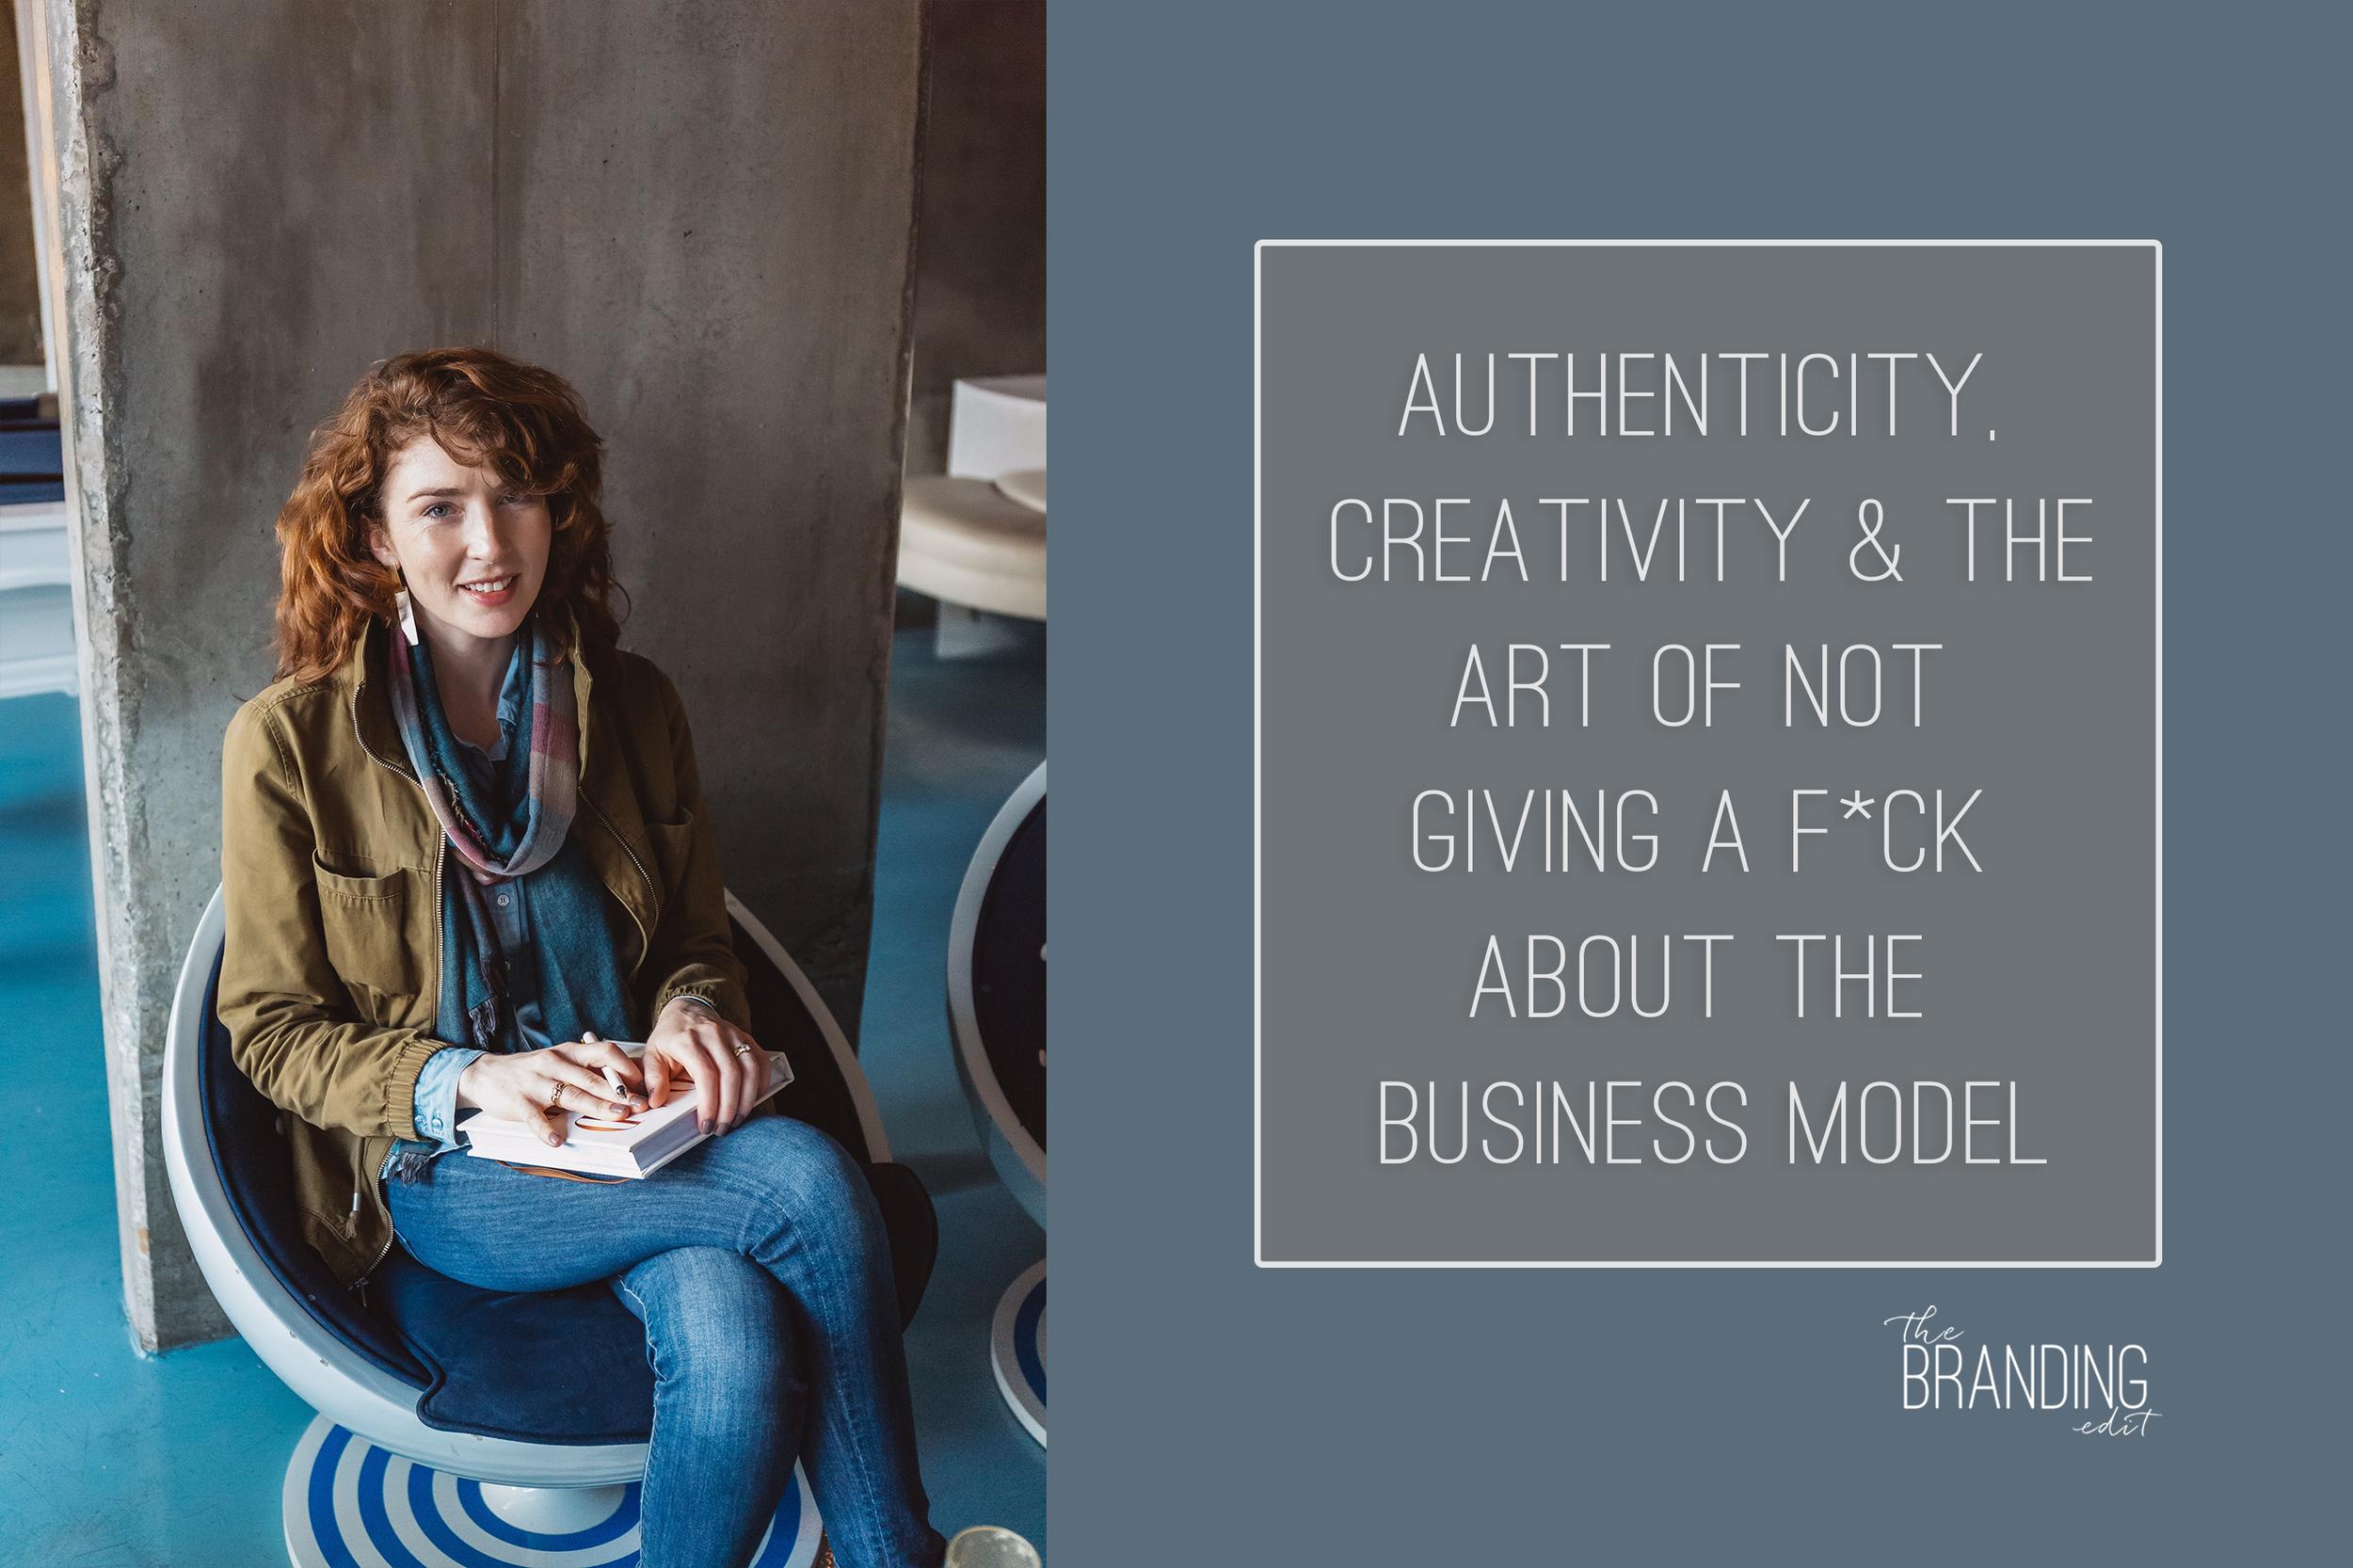 authenticity_creativity_artofnotgivingF.png